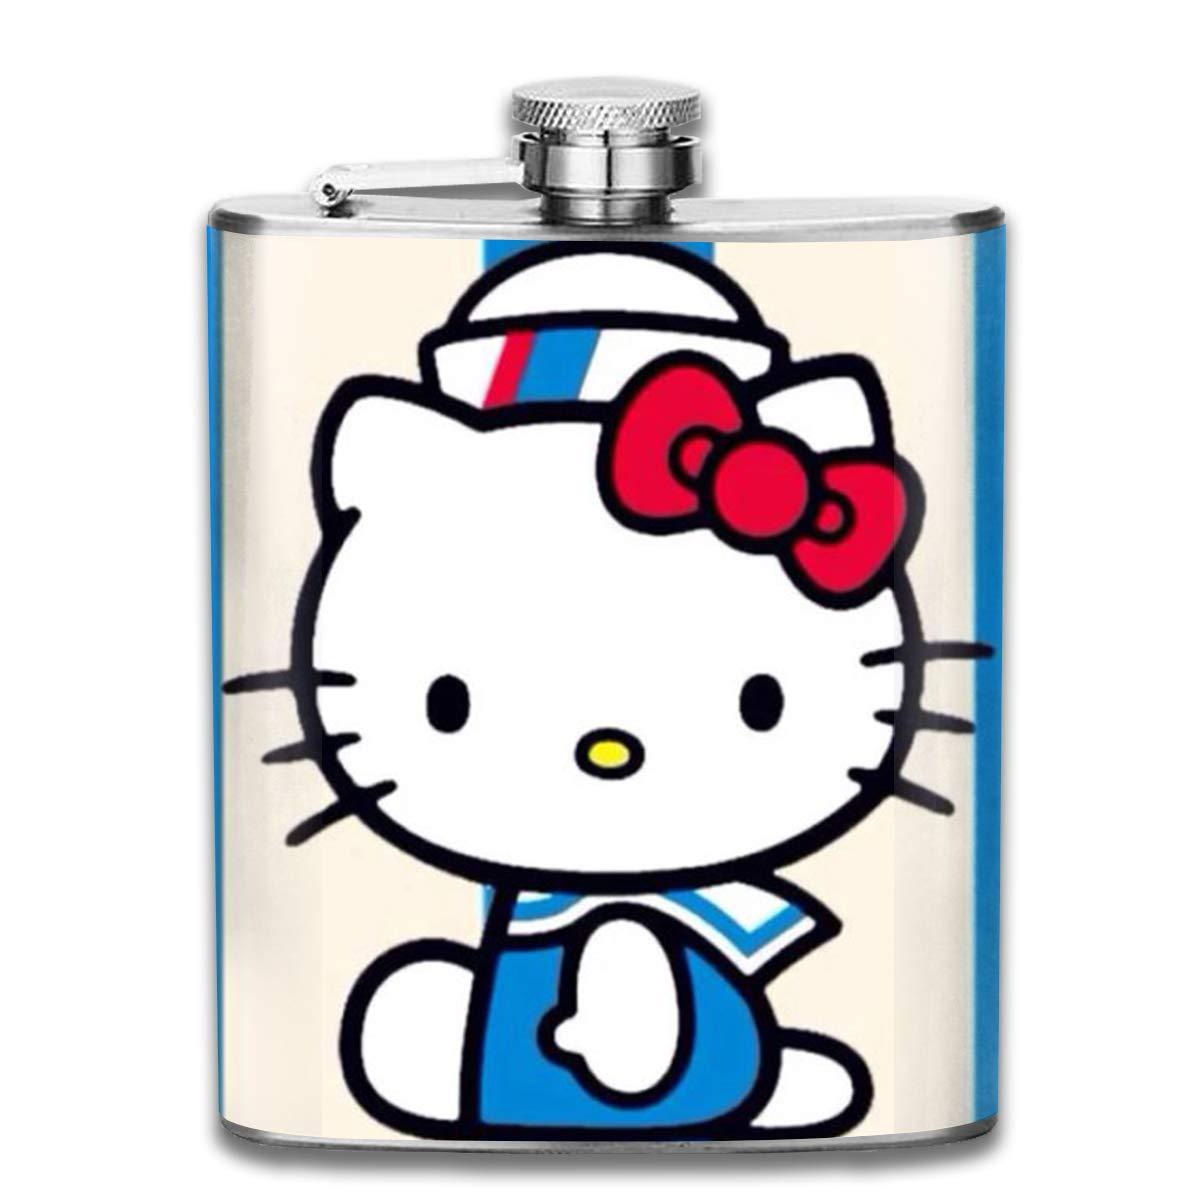 c59cac78f Amazon.com: LJYD Stainless Steel Flask Hello Kitty Sailor Art Print 7 Oz  Hip Flask: Home & Kitchen